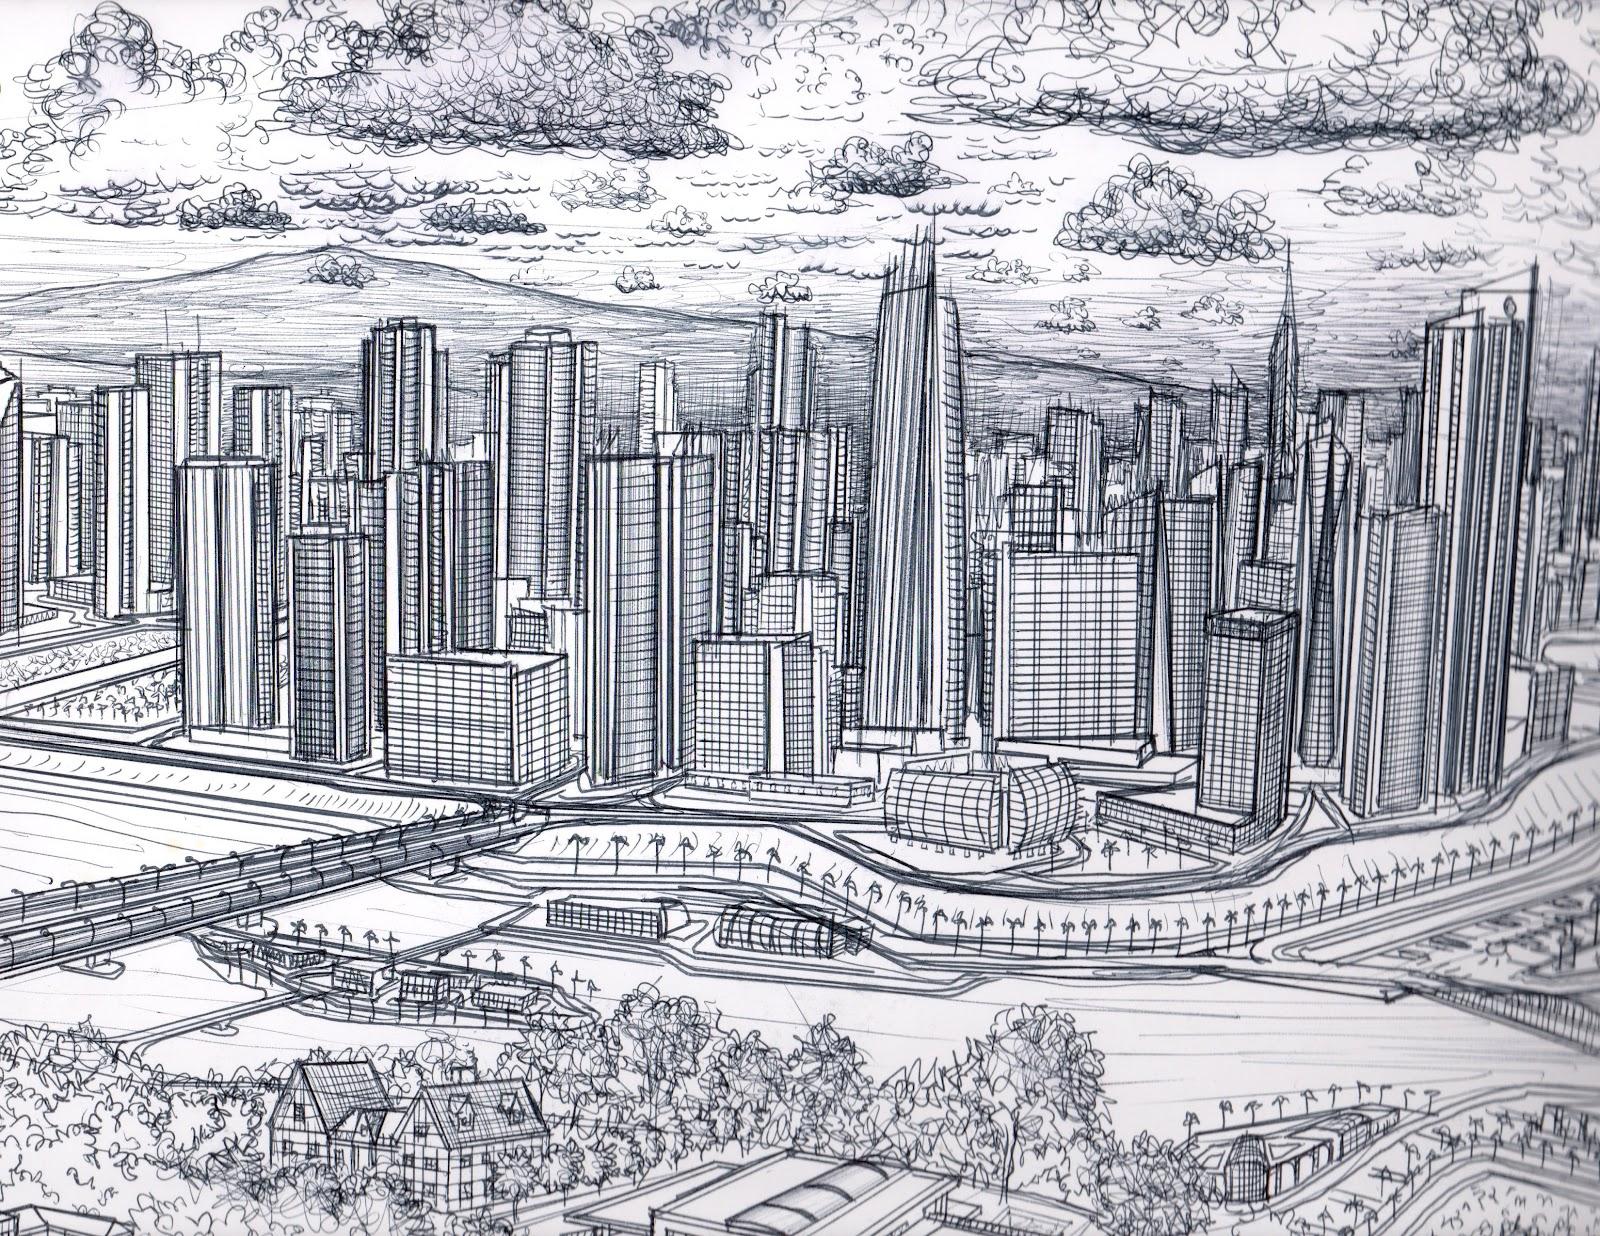 1600x1236 City Building Drawings Of Impressive Img018 Asbienestar.co